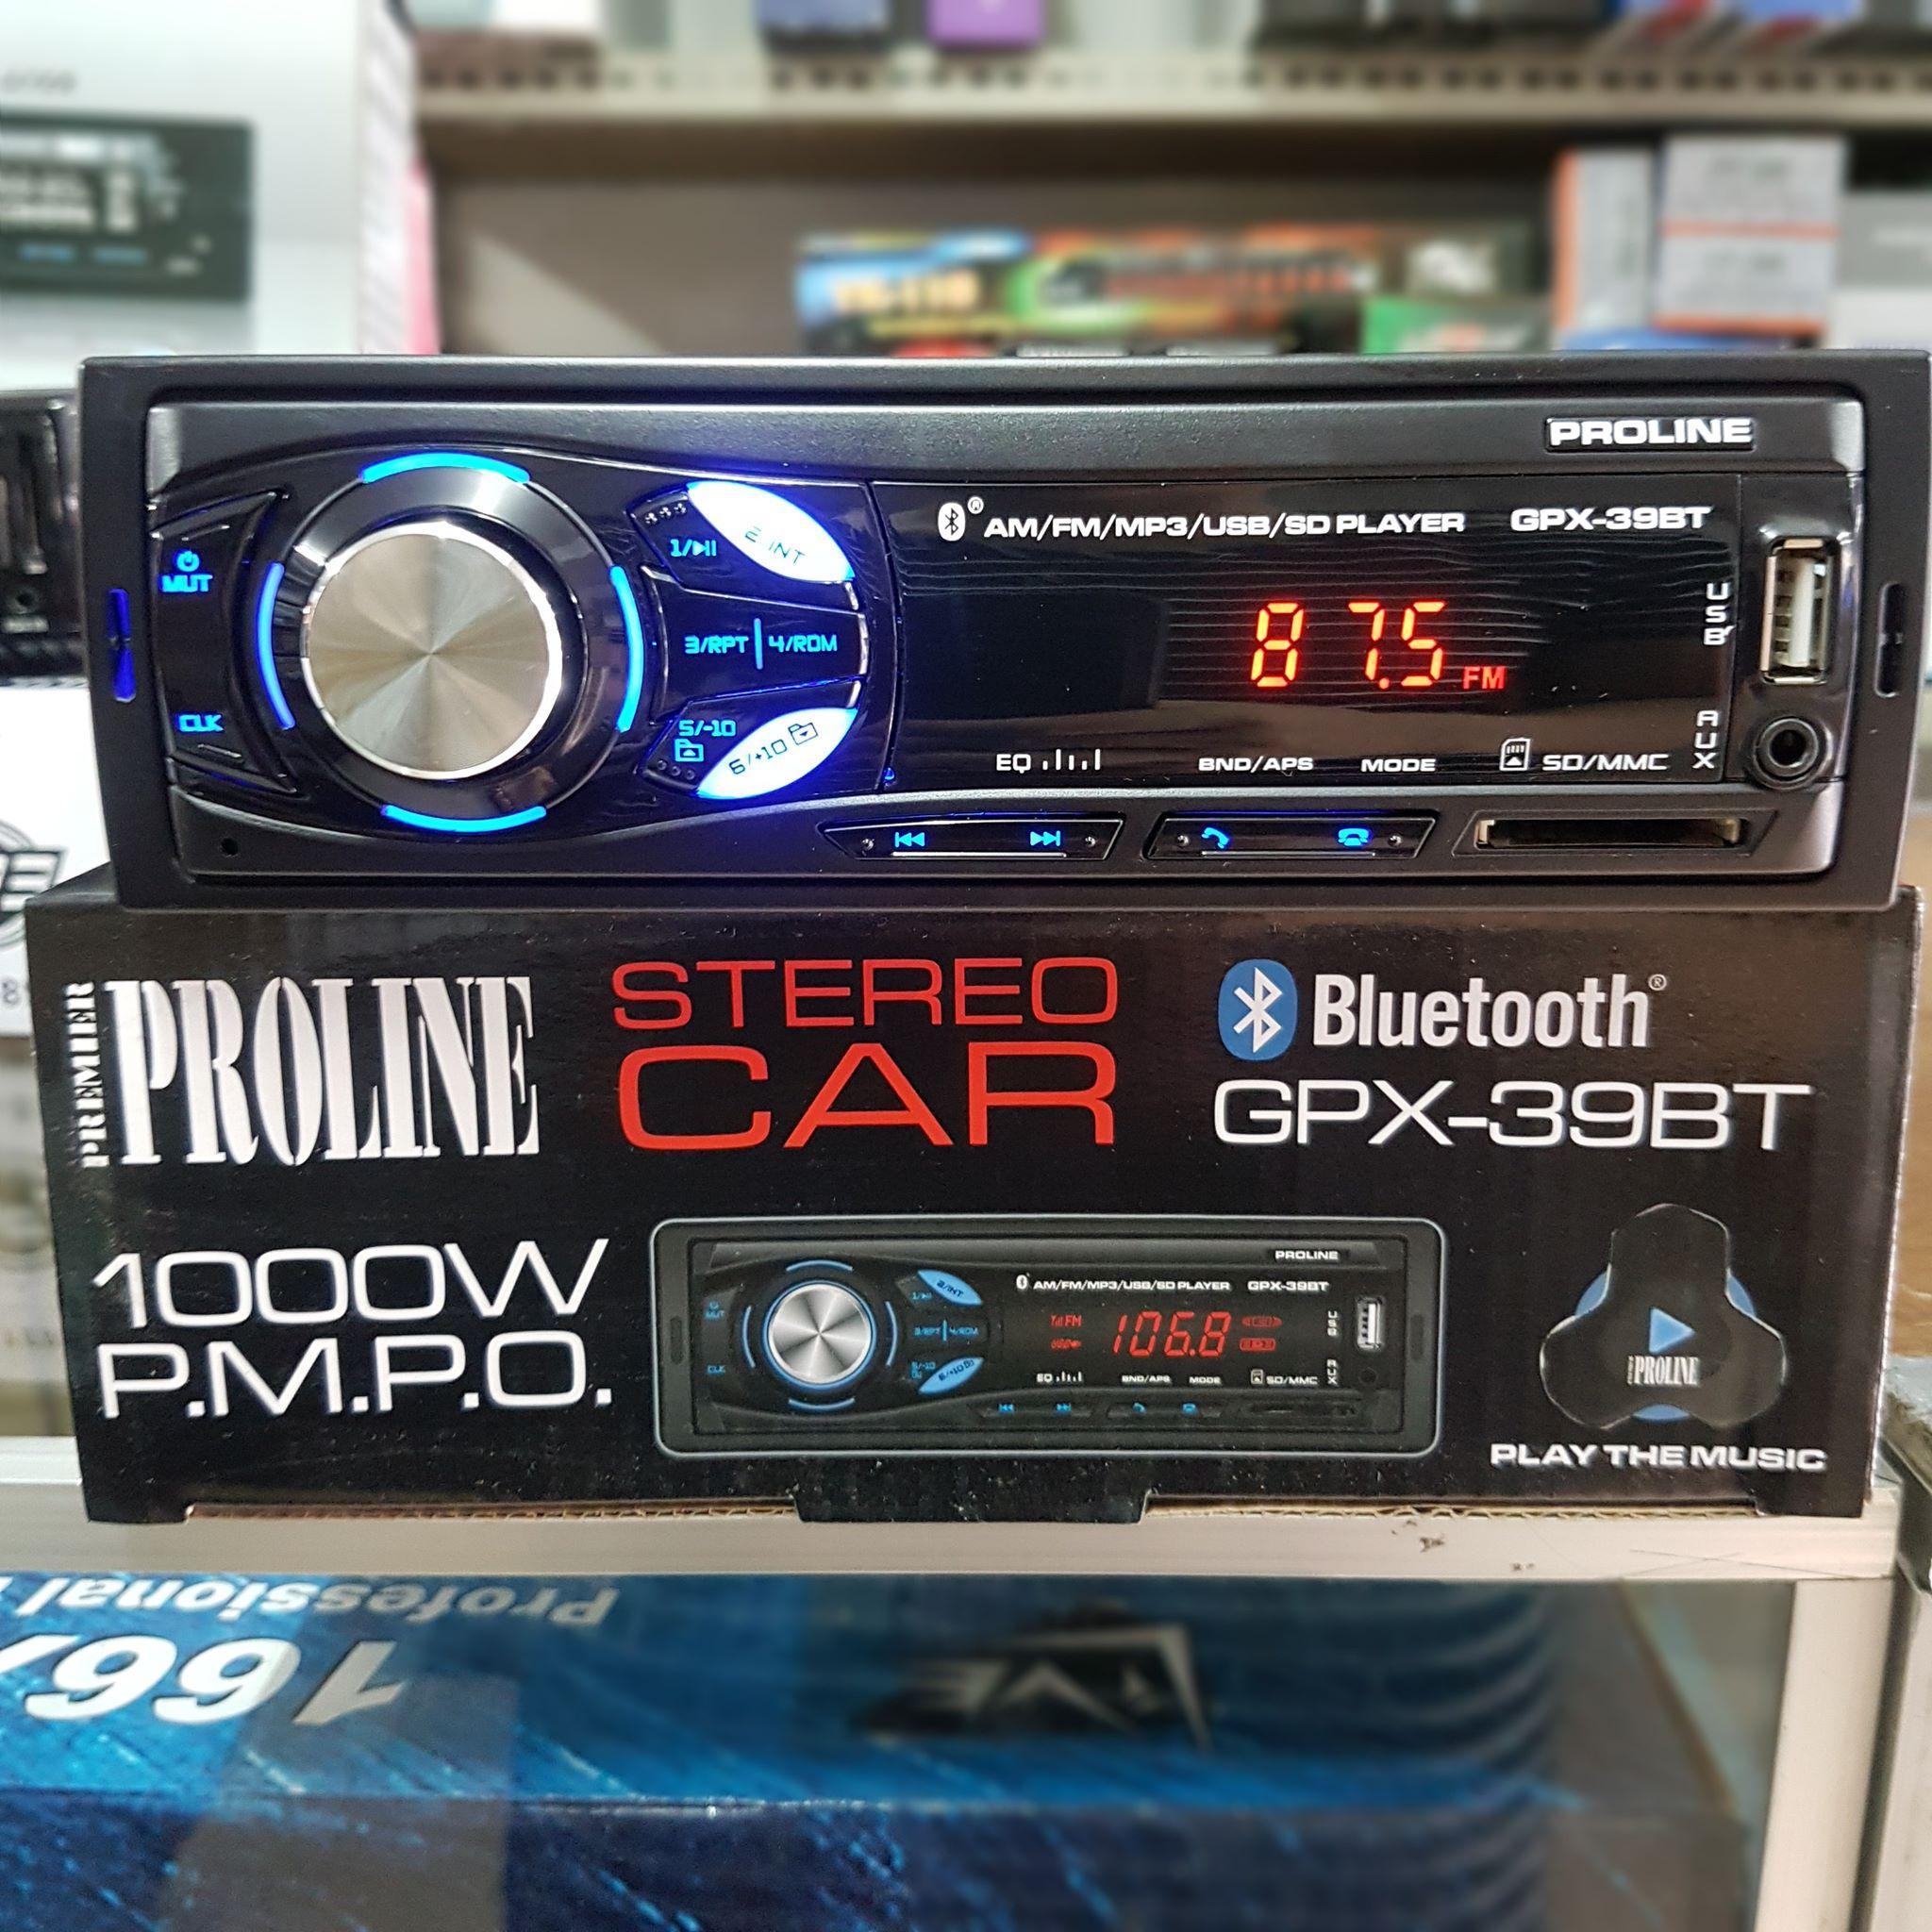 Proline GPX-39BT Car Stereo w/ AM/FM, Bluetooth, USB, MP3 Player